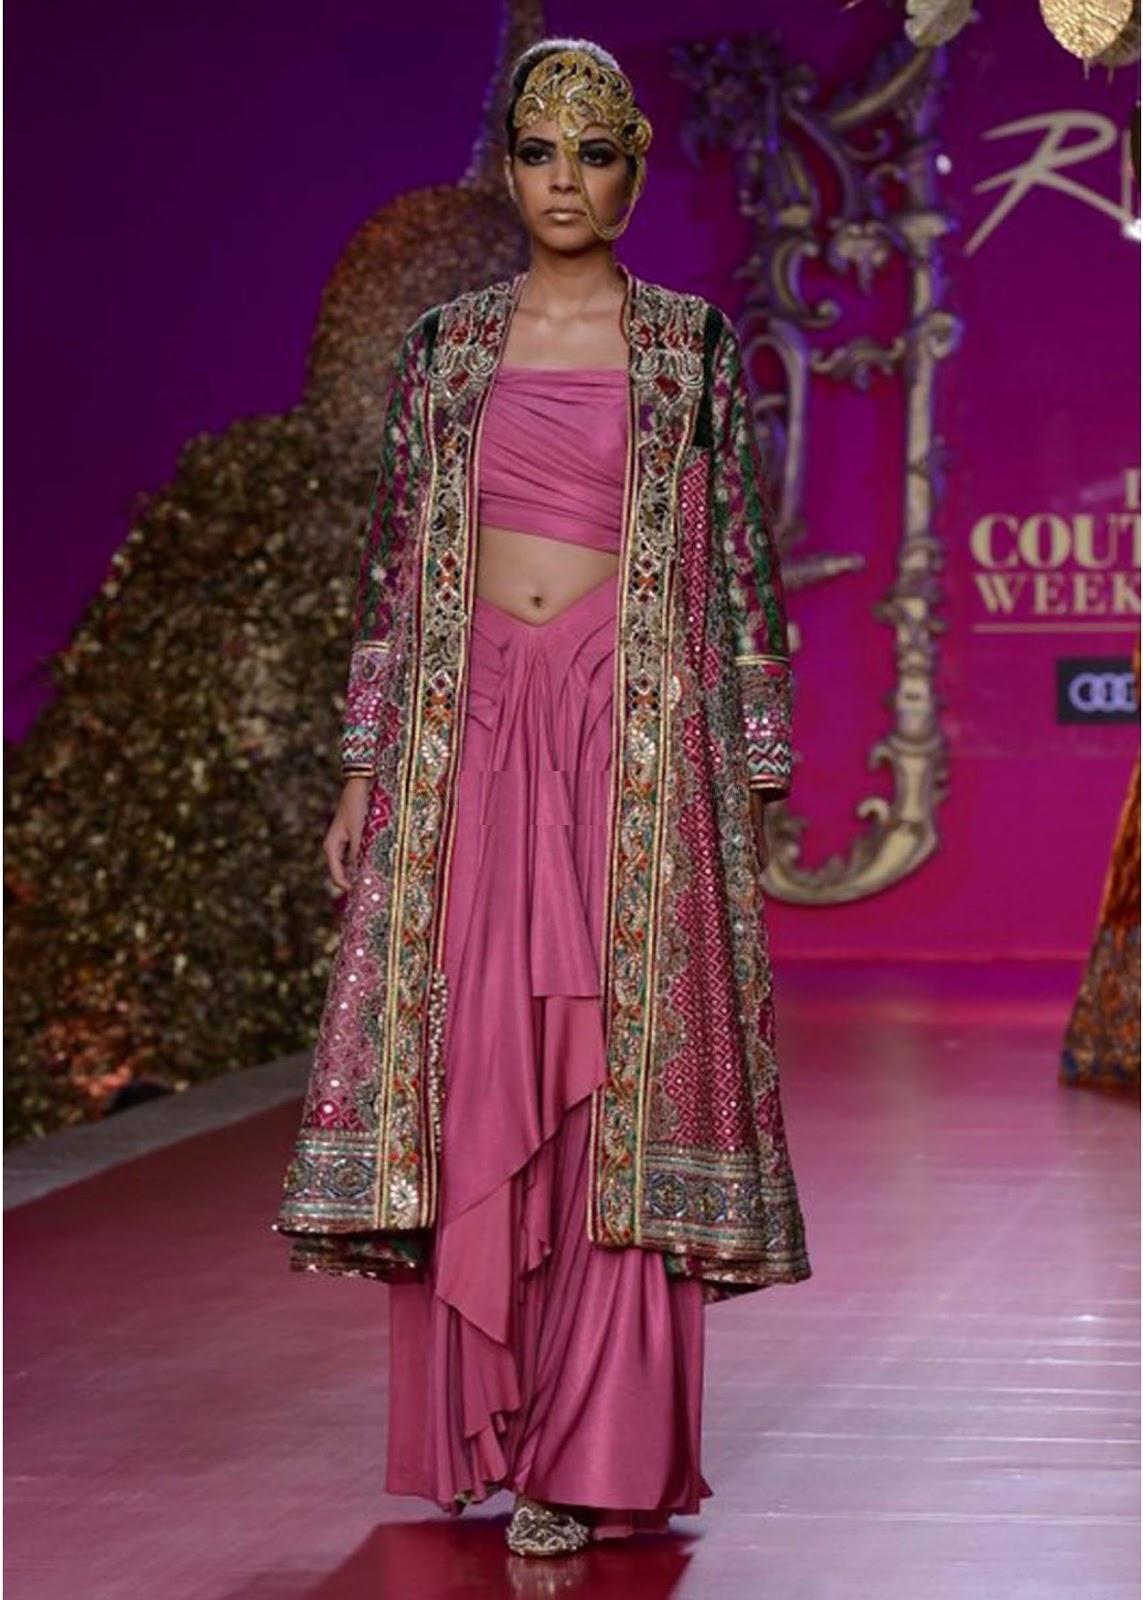 Ritu-Beri-2013-pcJ-cuture-fashion-week-cxollection